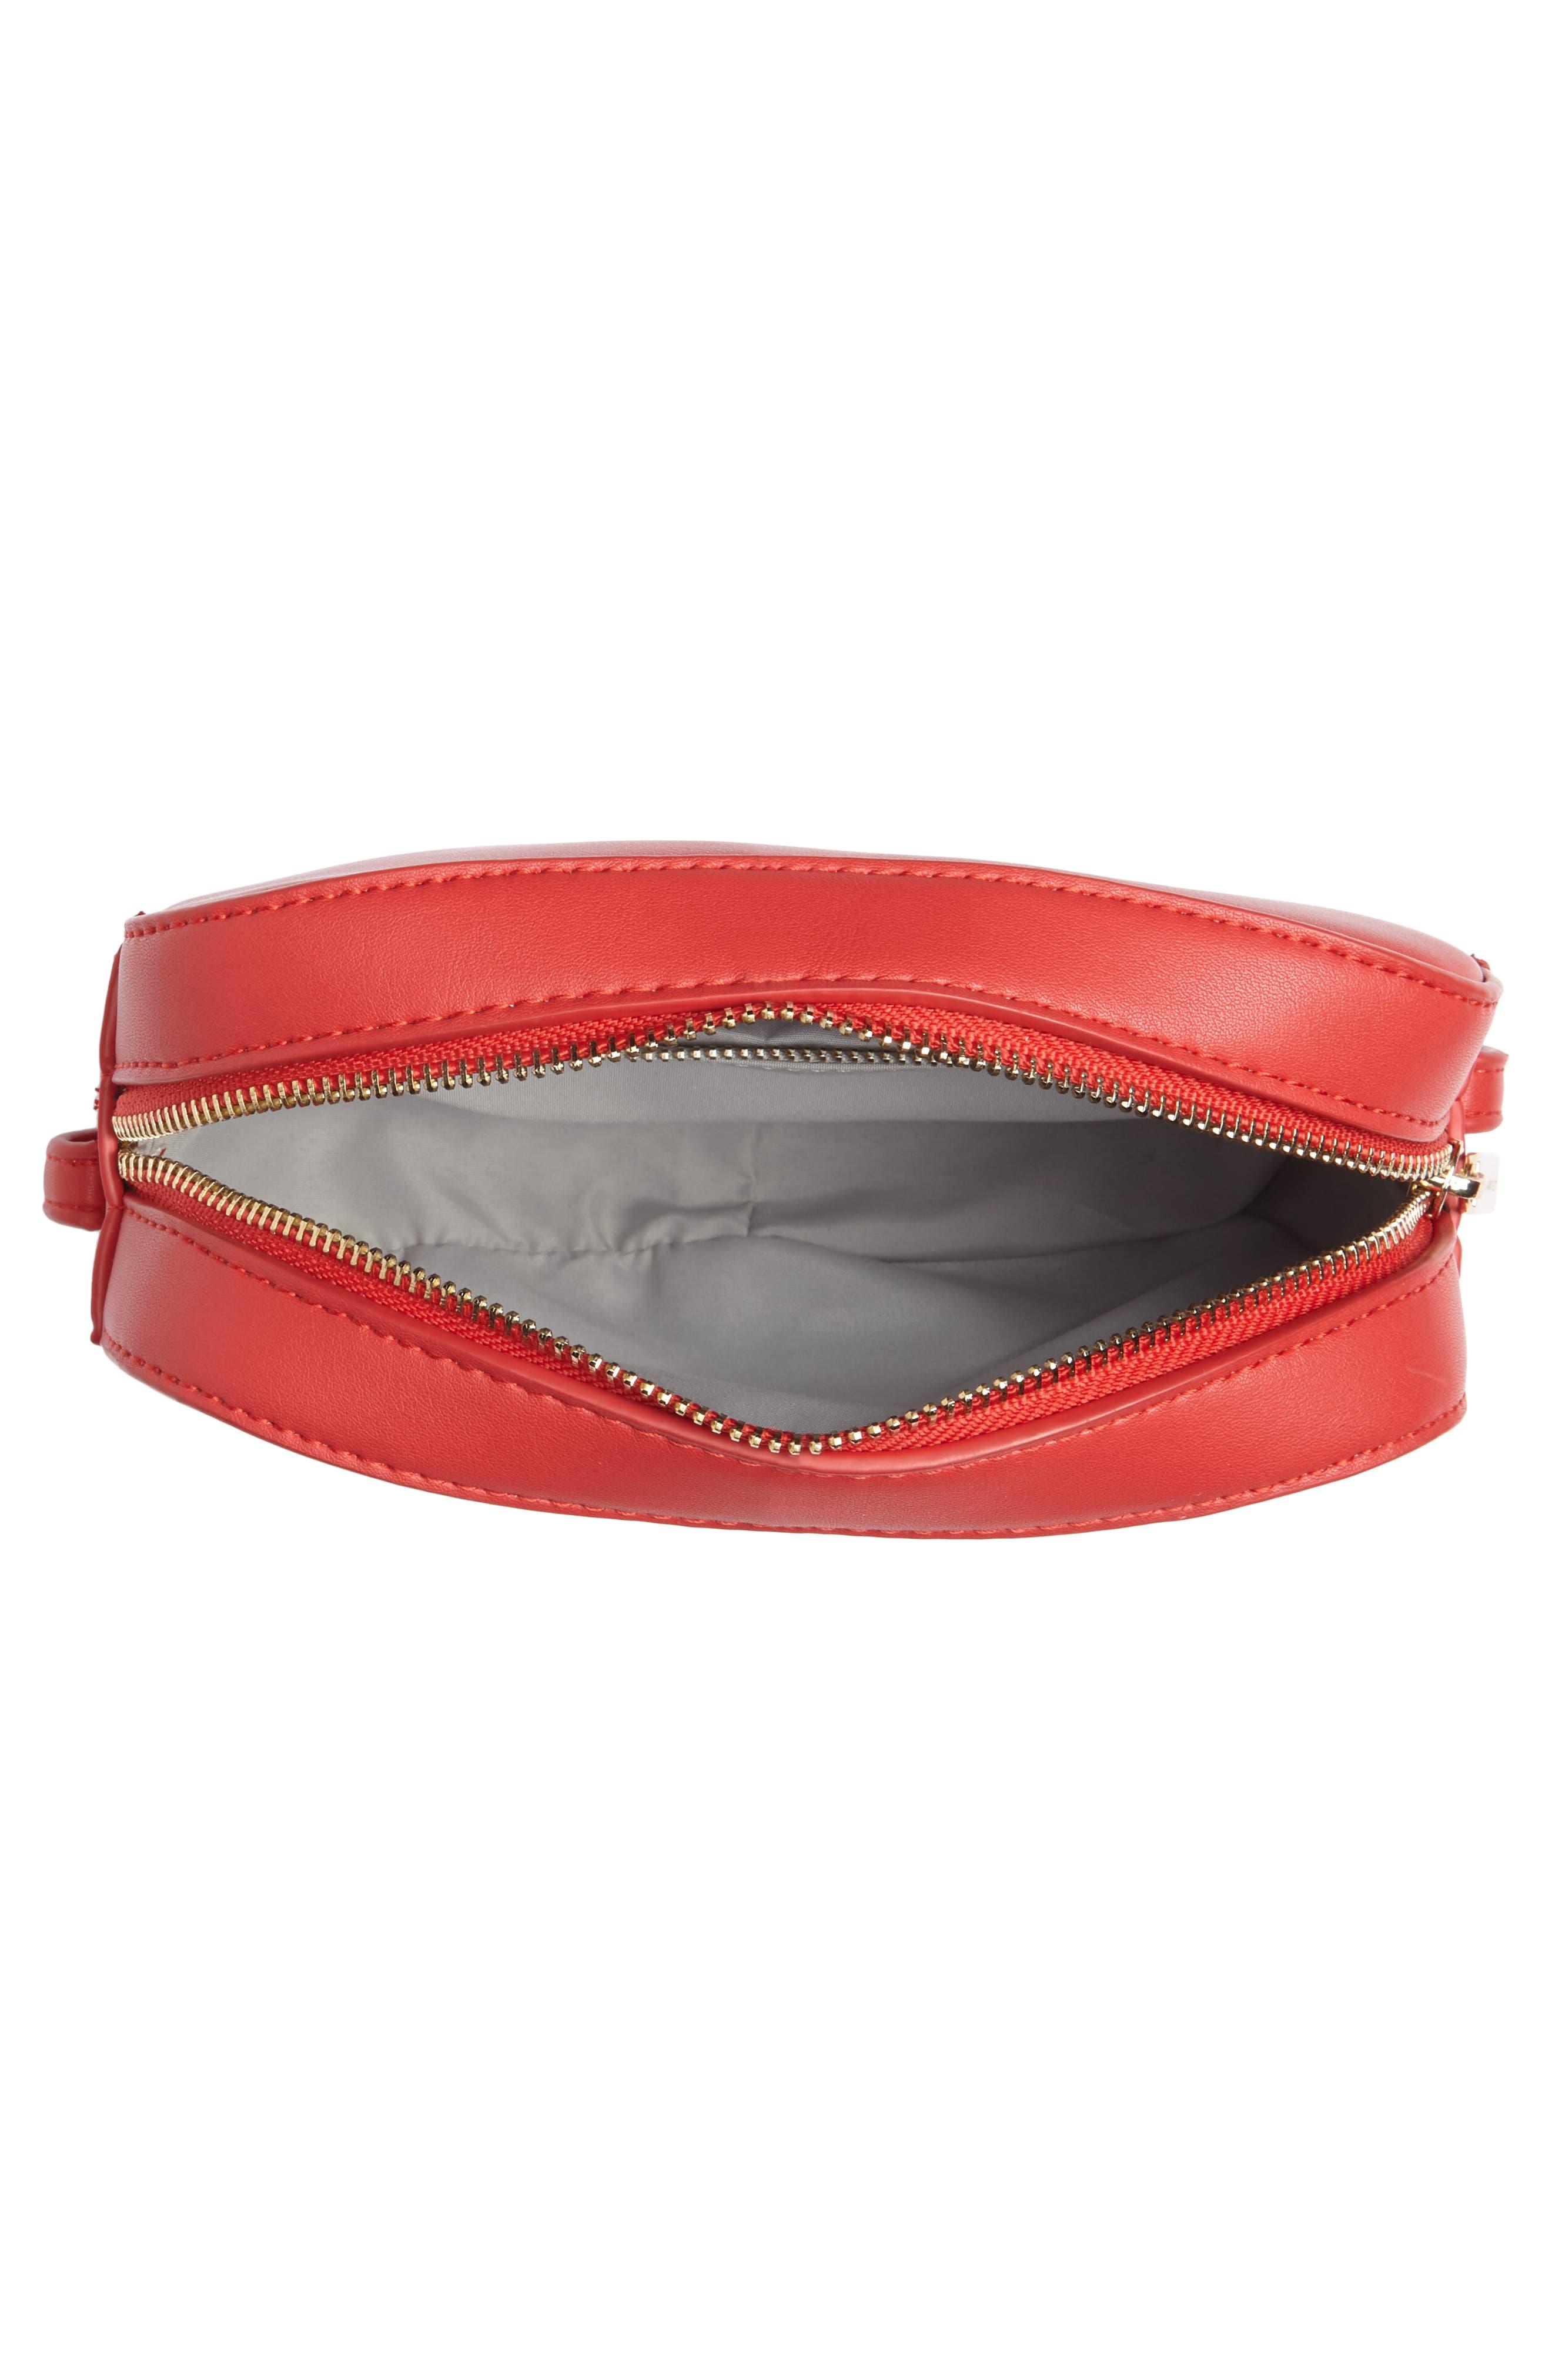 Faux Leather Box Bag,                             Alternate thumbnail 7, color,